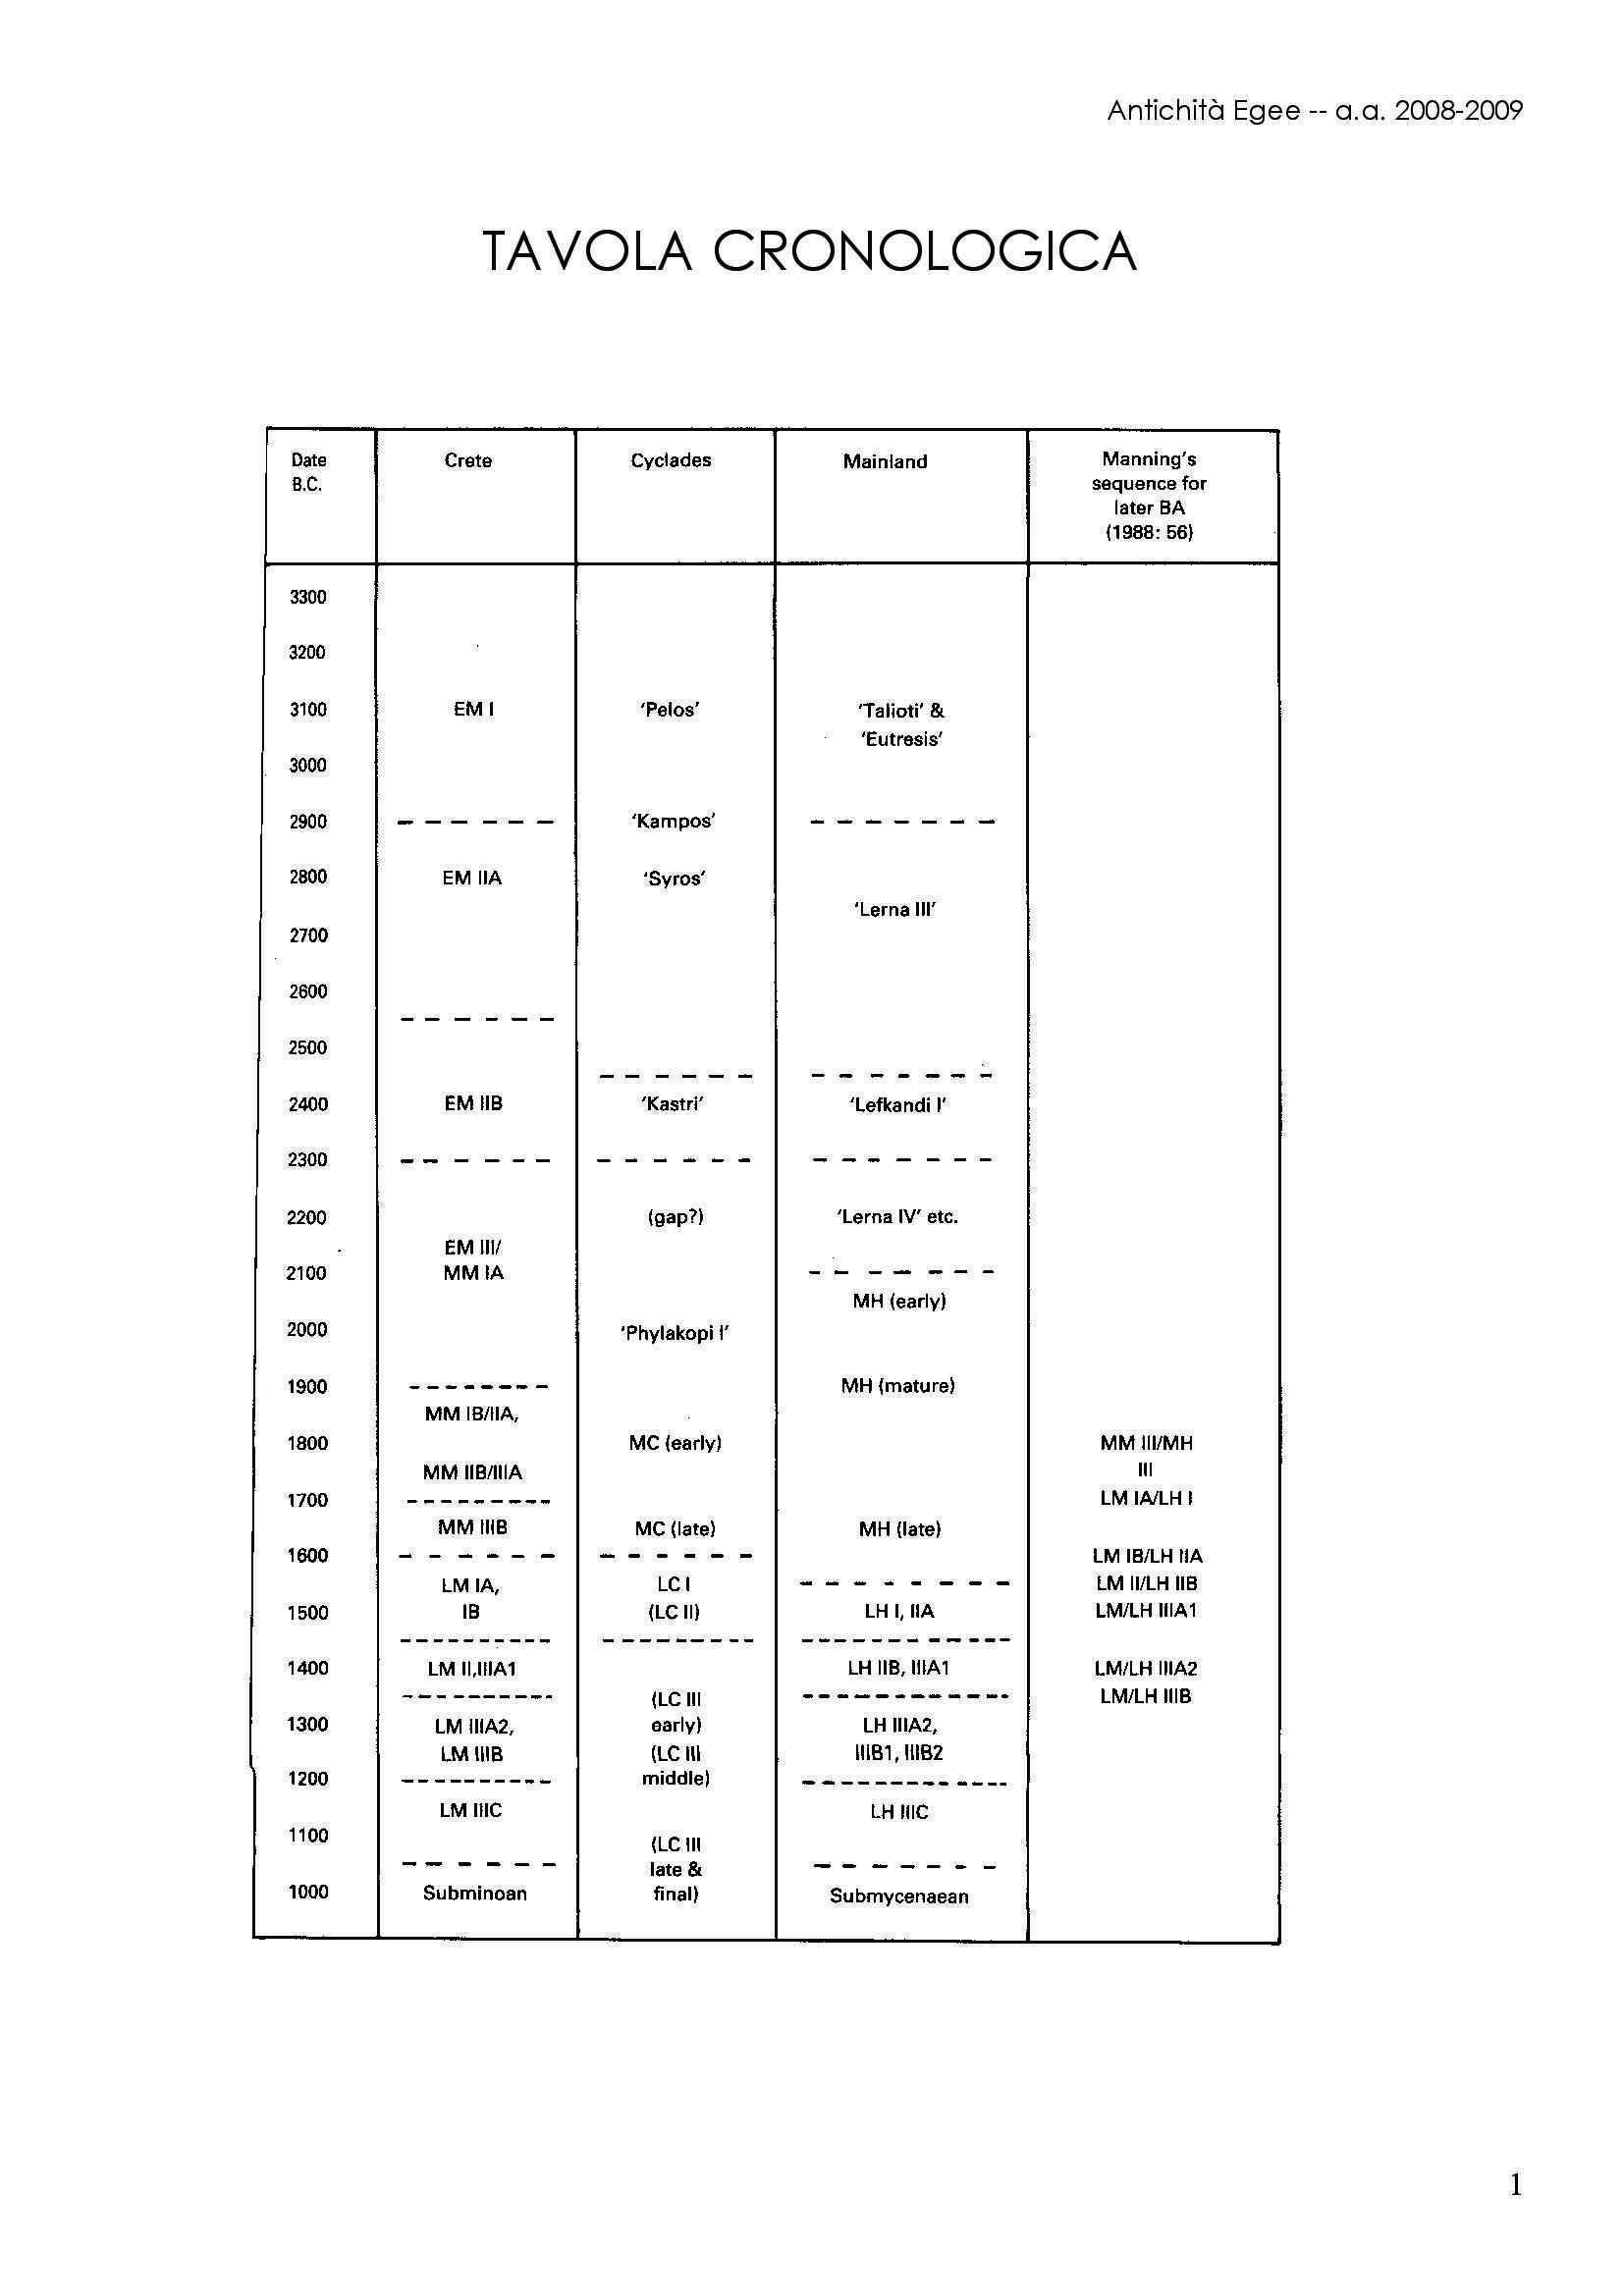 Tavola cronologica